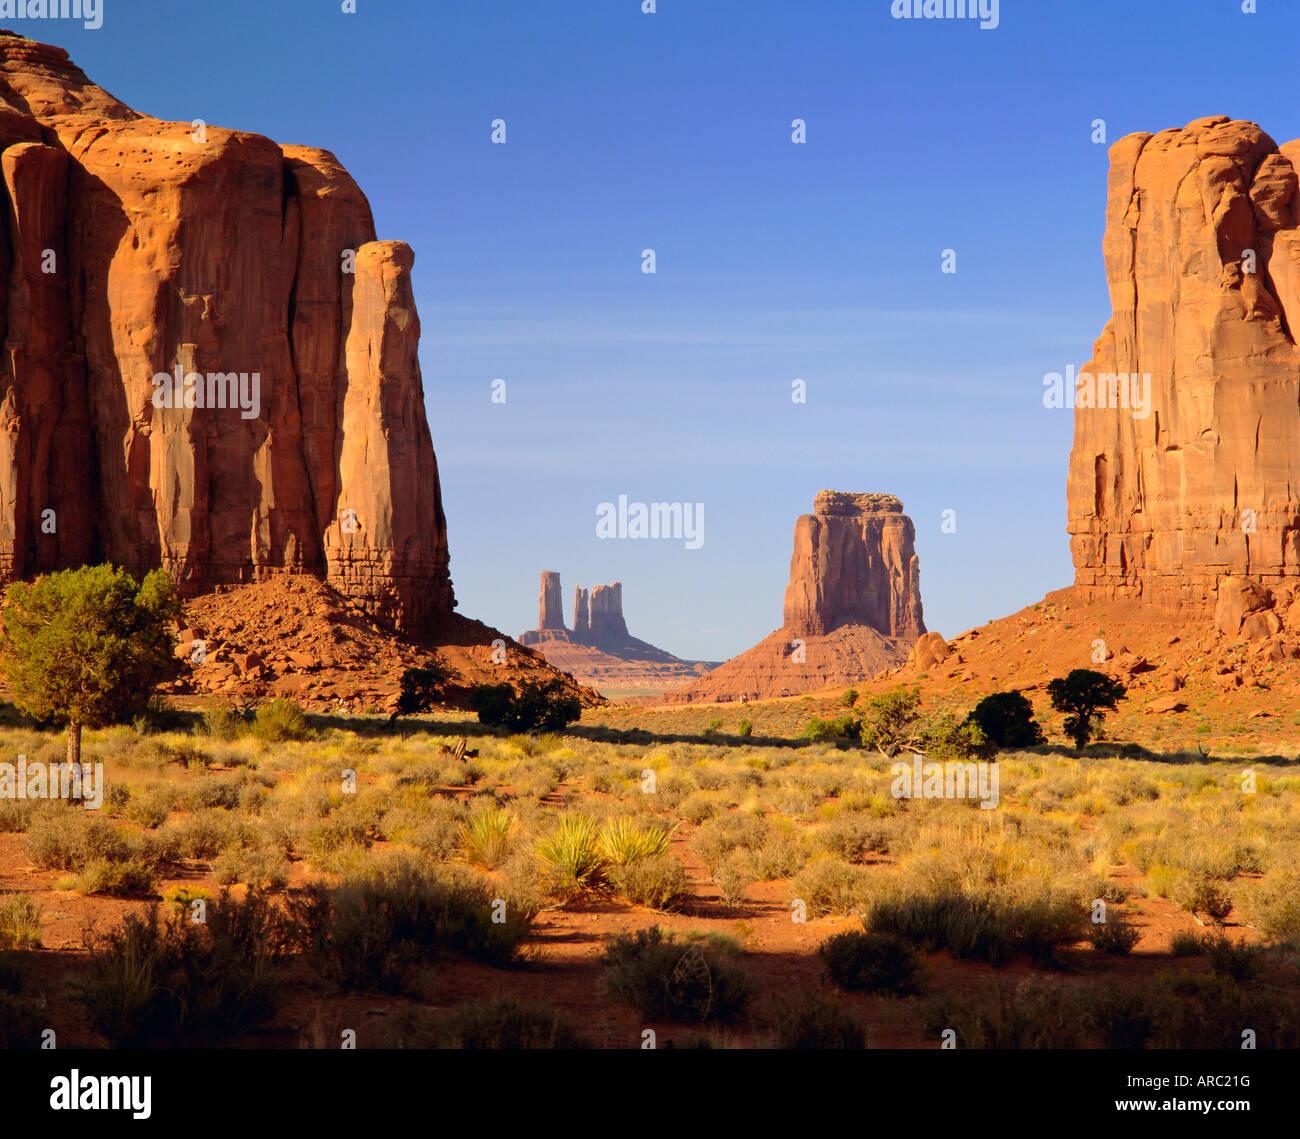 Navajo Tribal Reservation, Monument Valley, Utah/Arizona, USA - Stock Image